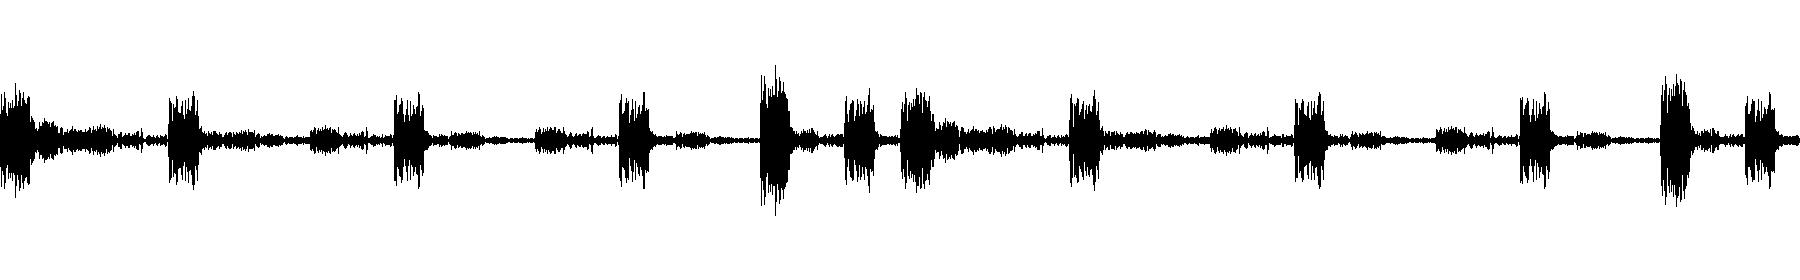 pth synth 05